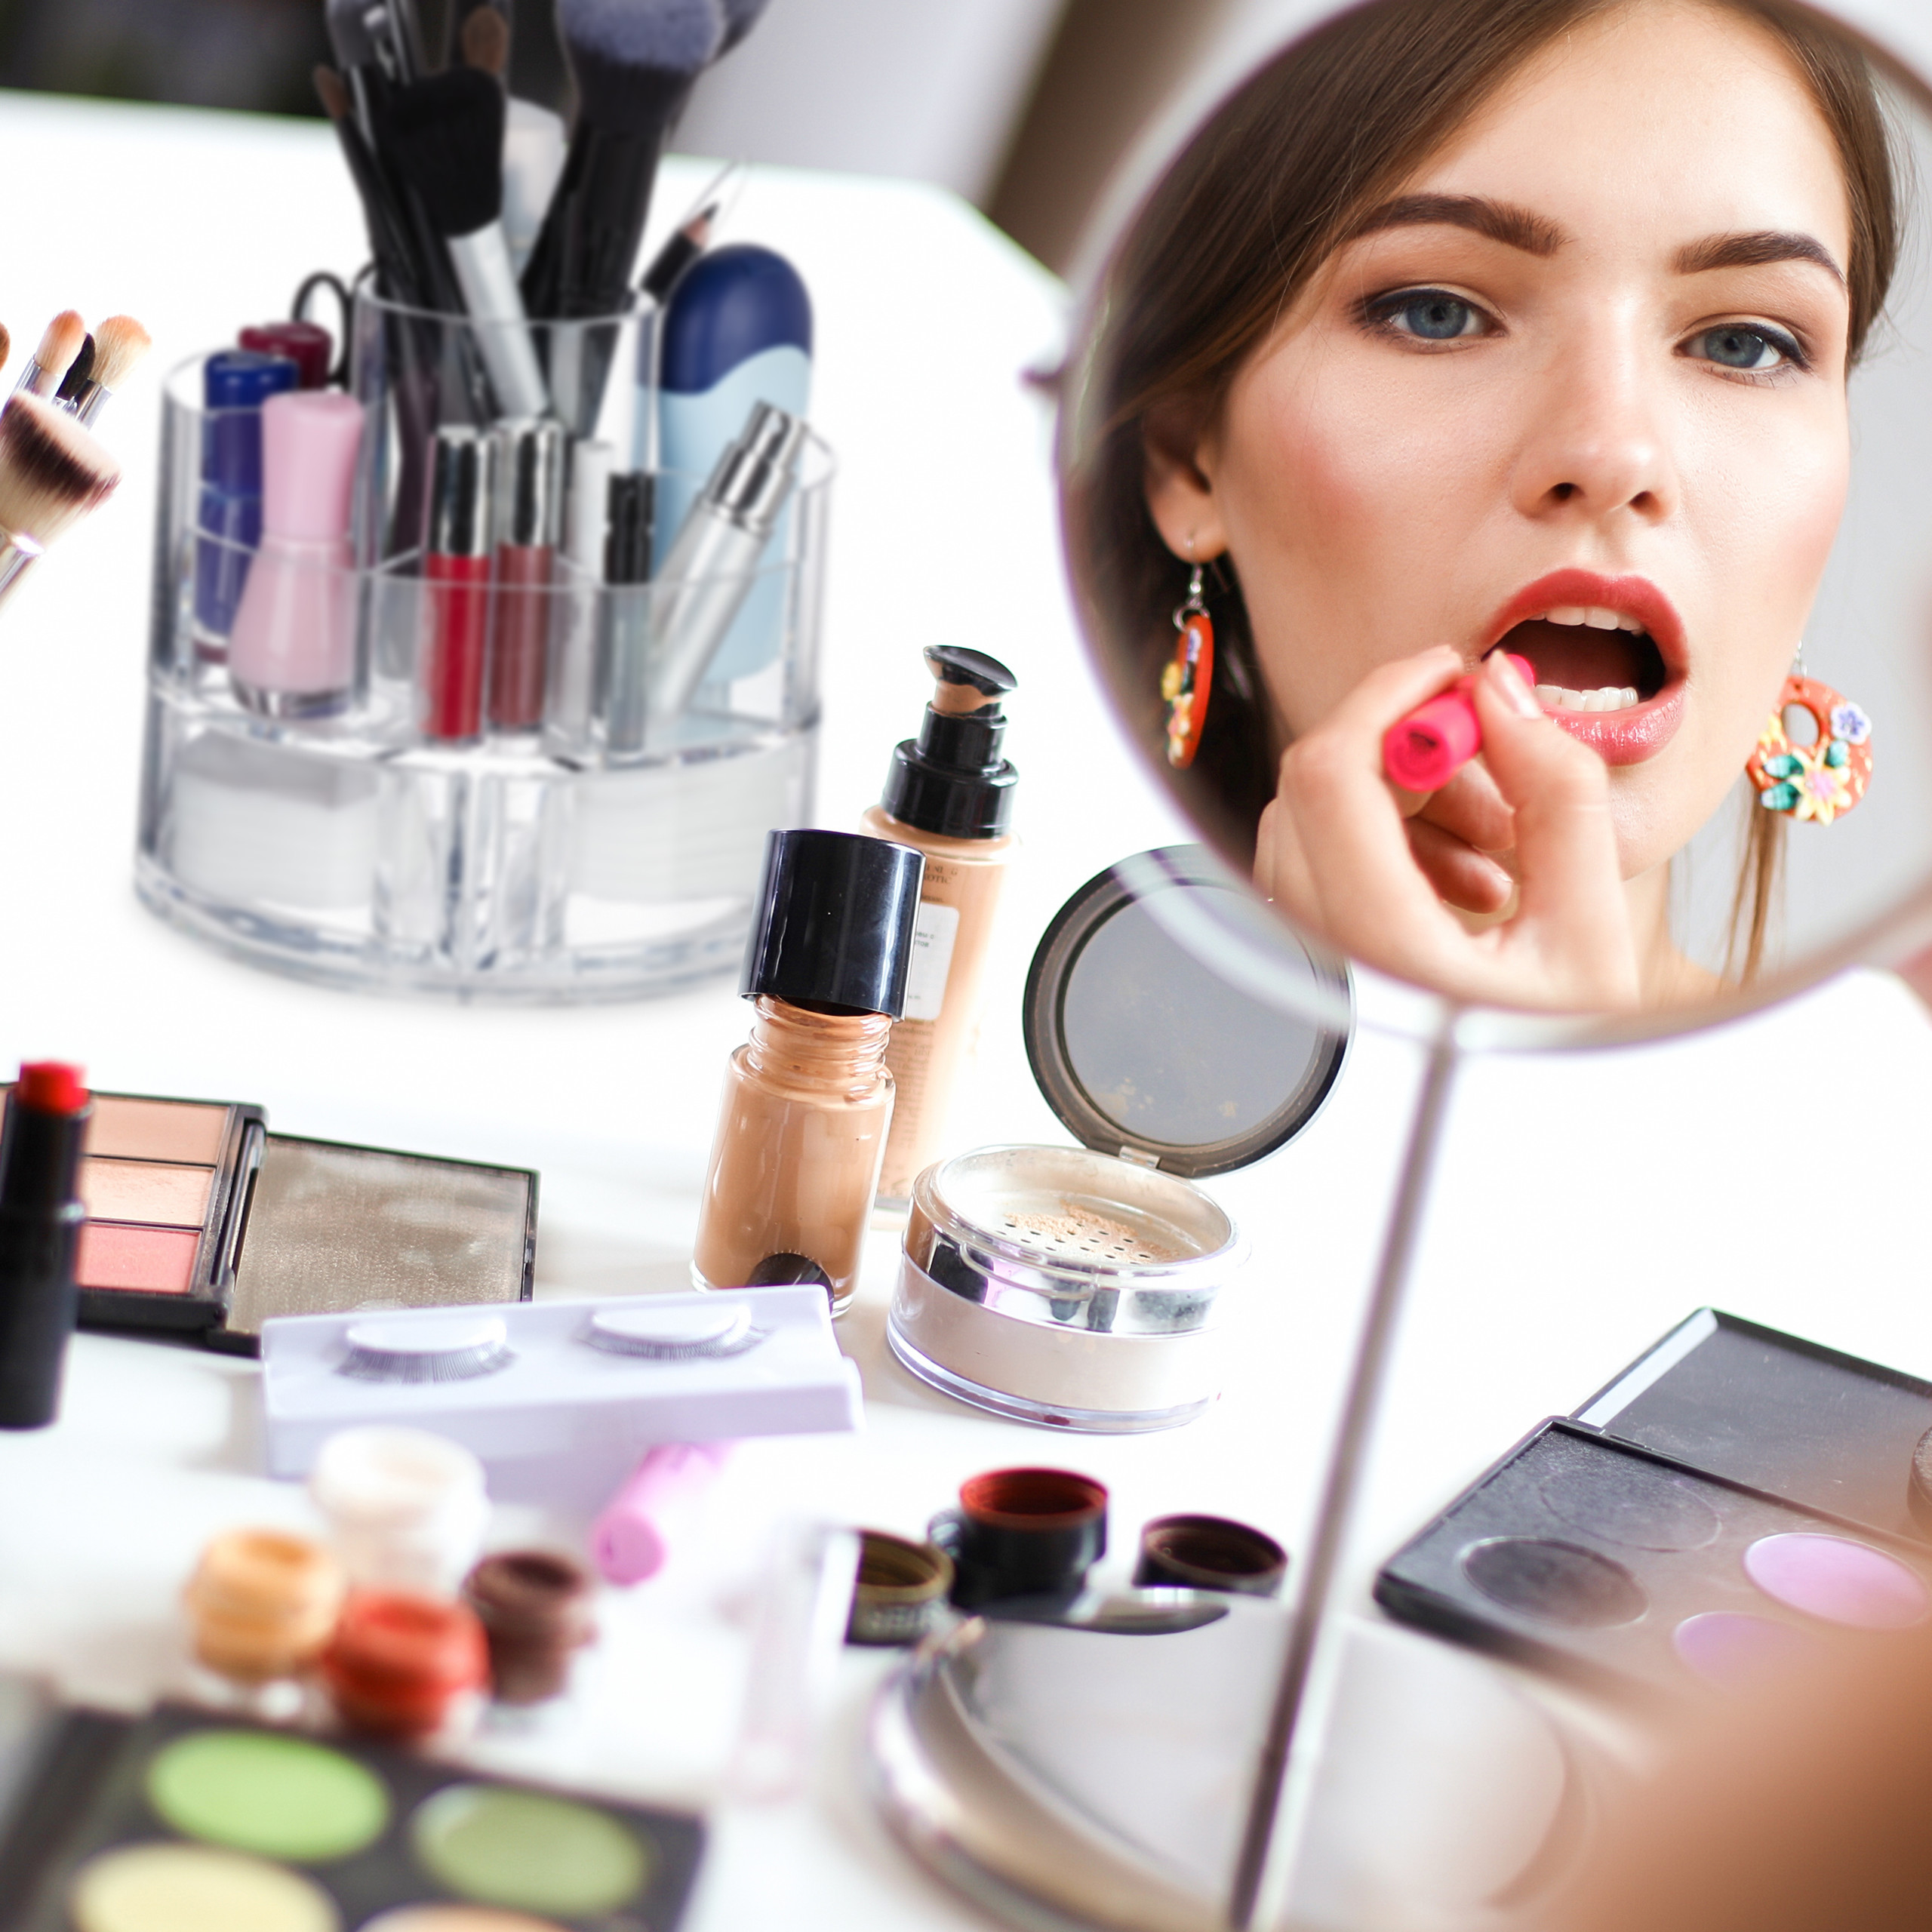 make-up-organizer-acryl-rond-cosmetica-opbergen-opbergsysteem miniatuur 6